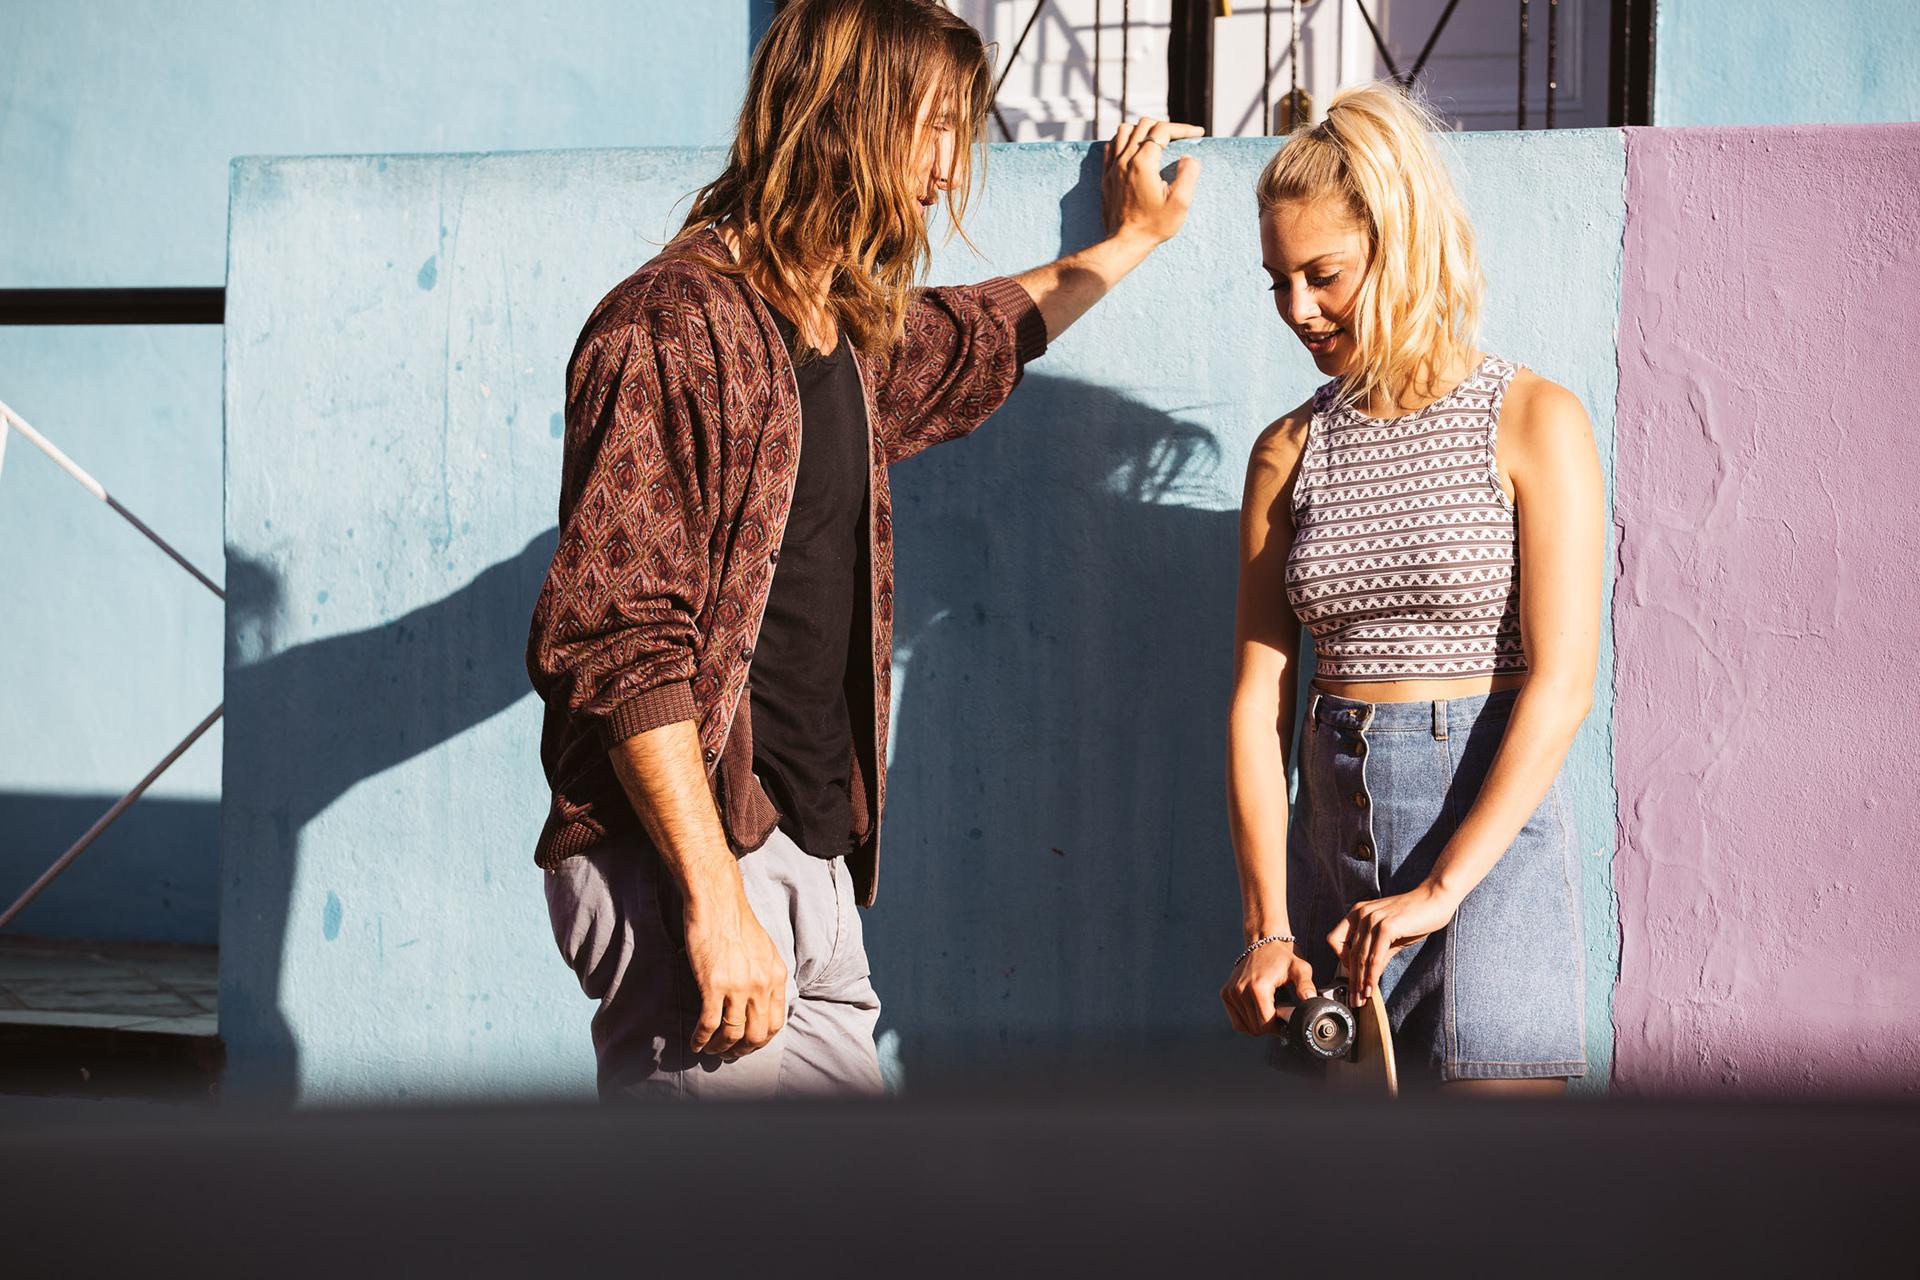 couple-street-style-colorful-skateboard